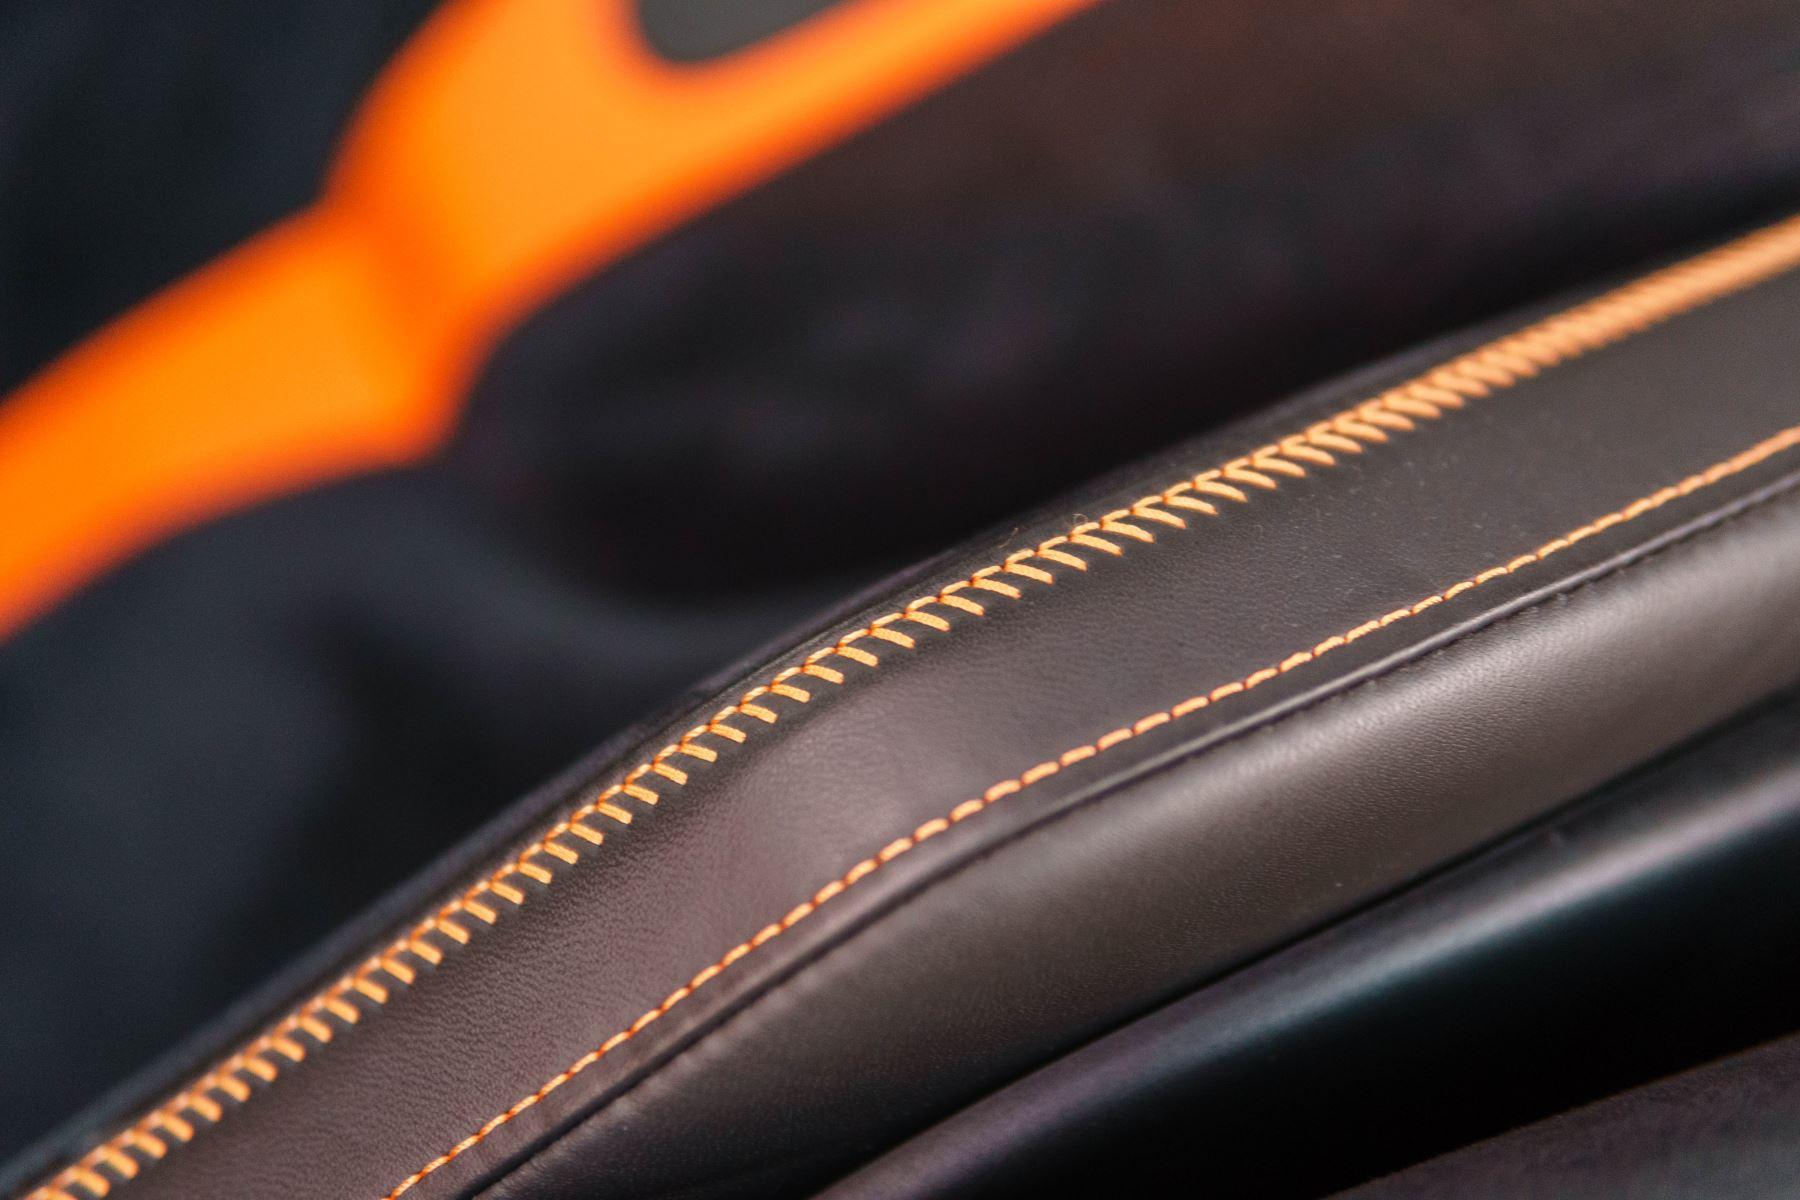 McLaren 720S Performance Coupe  image 65